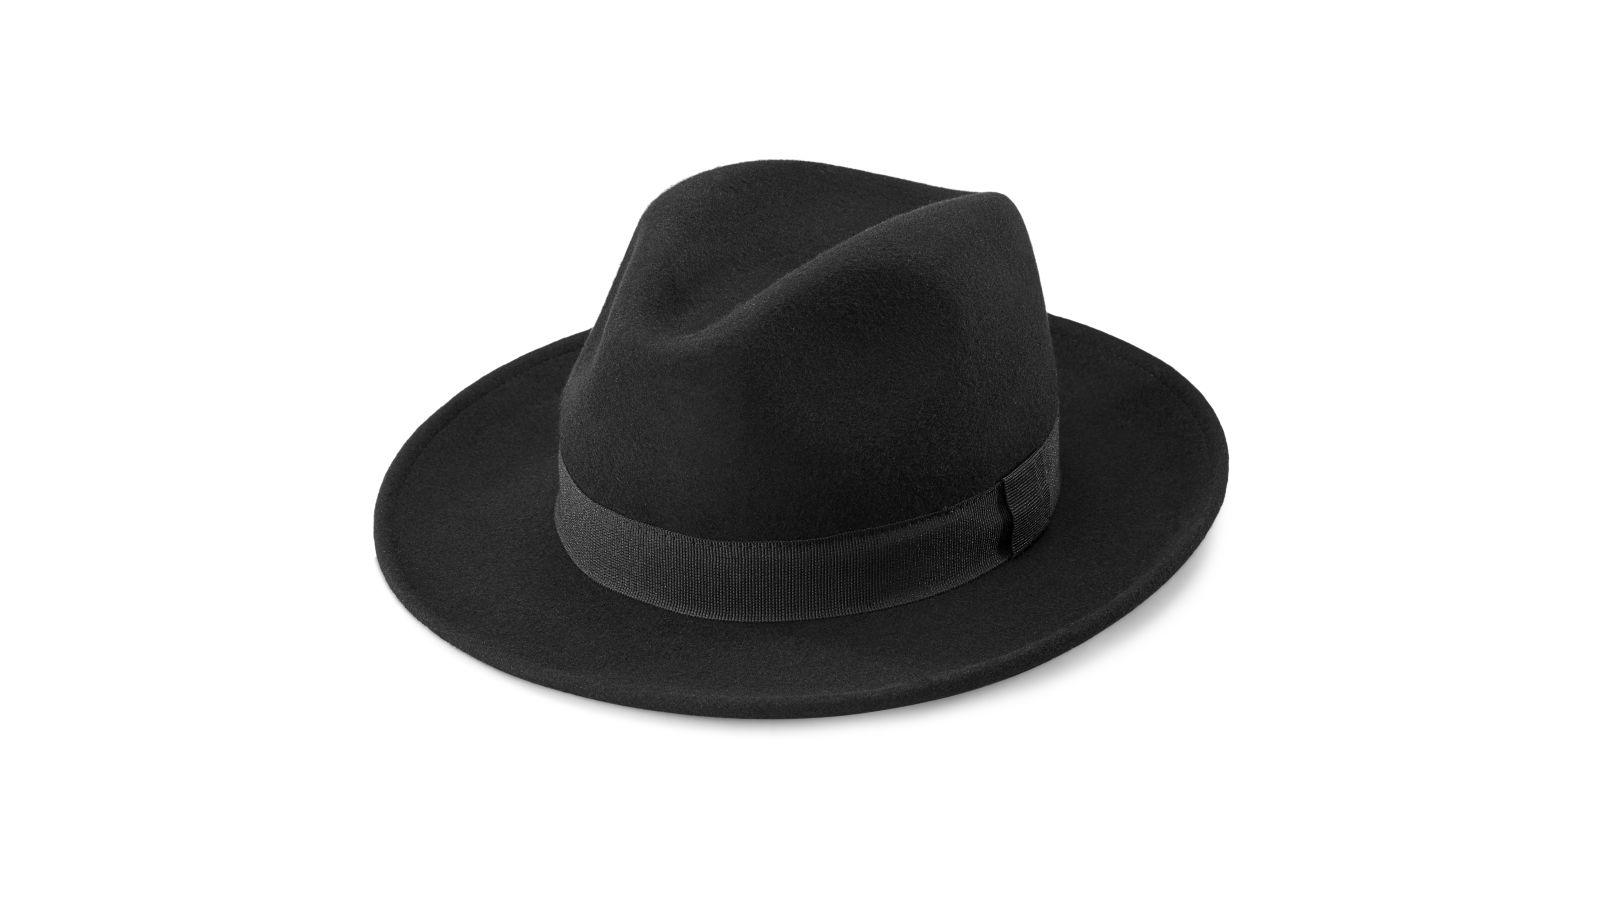 Fido Alessandria fekete gyapjú fedora kalap  176282783d